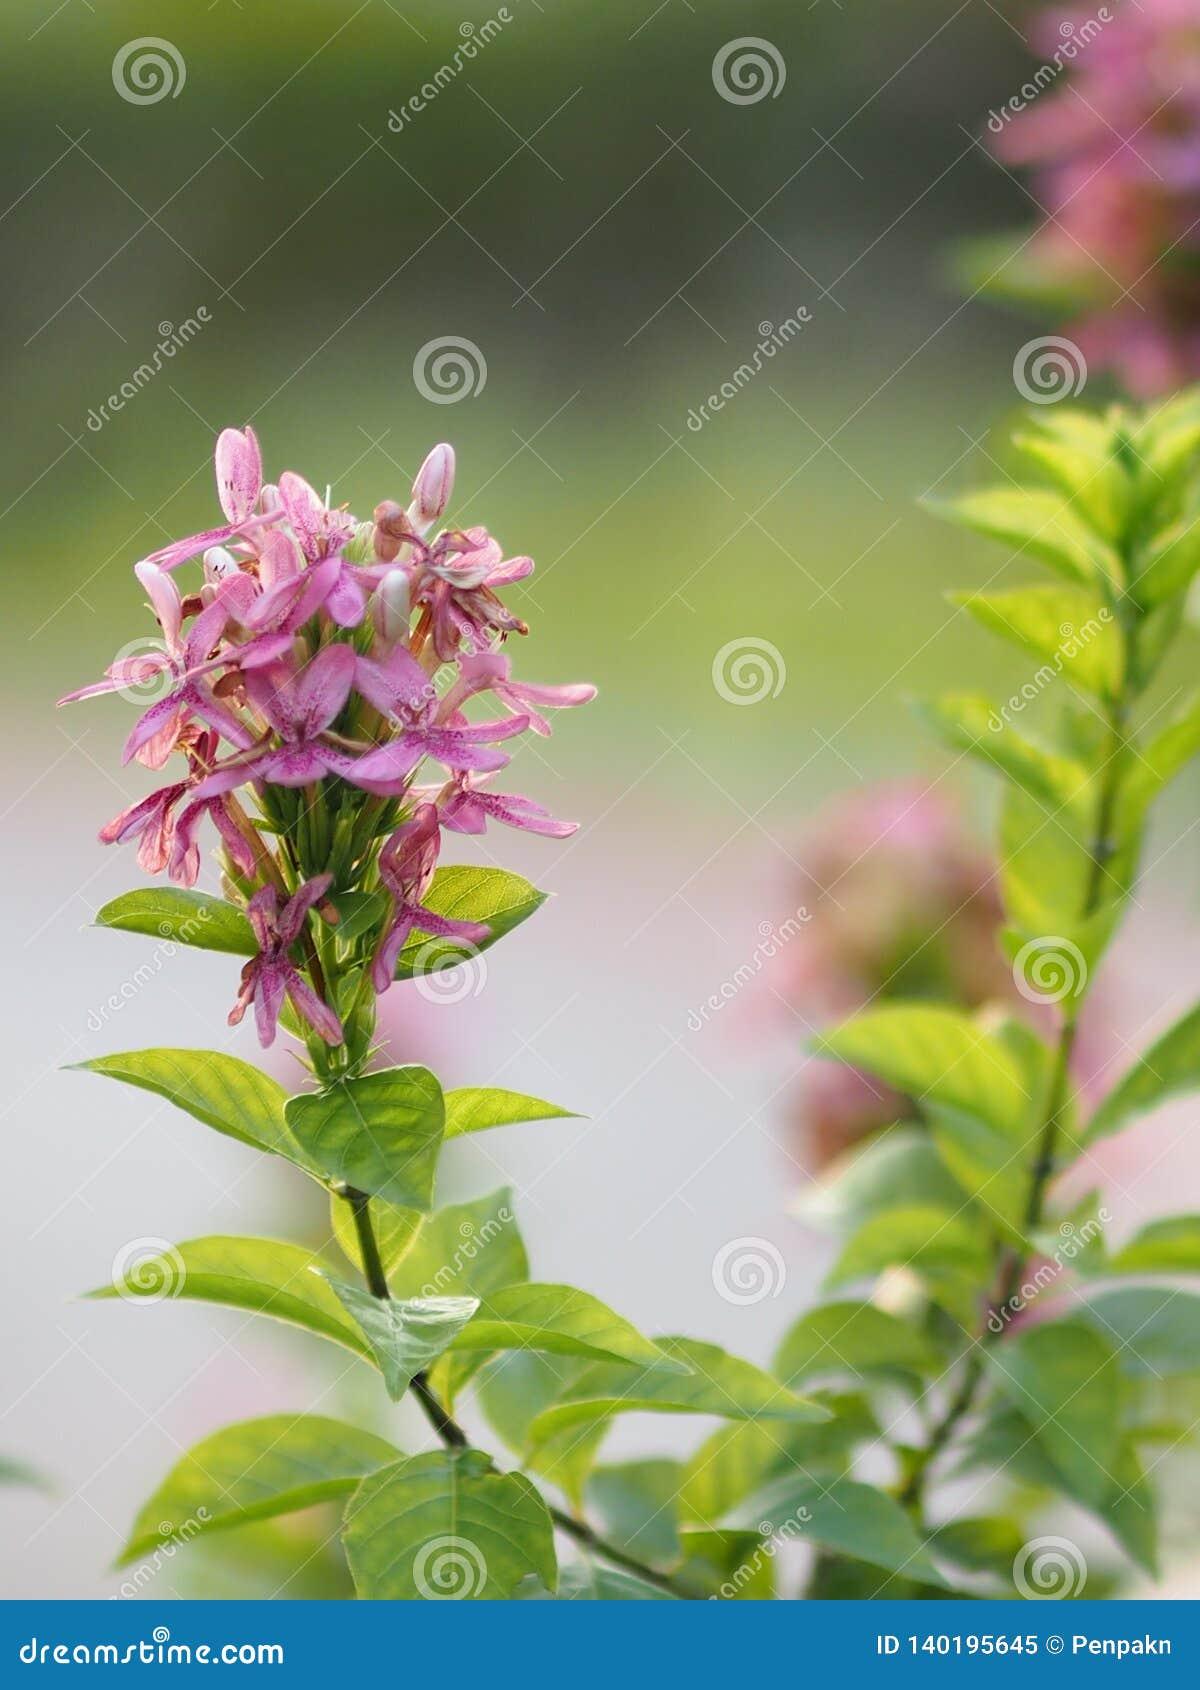 Blue sage Violet ixora flower Pseuderanthem andersonii Lindau ACANTHACEAE on blur background space for write